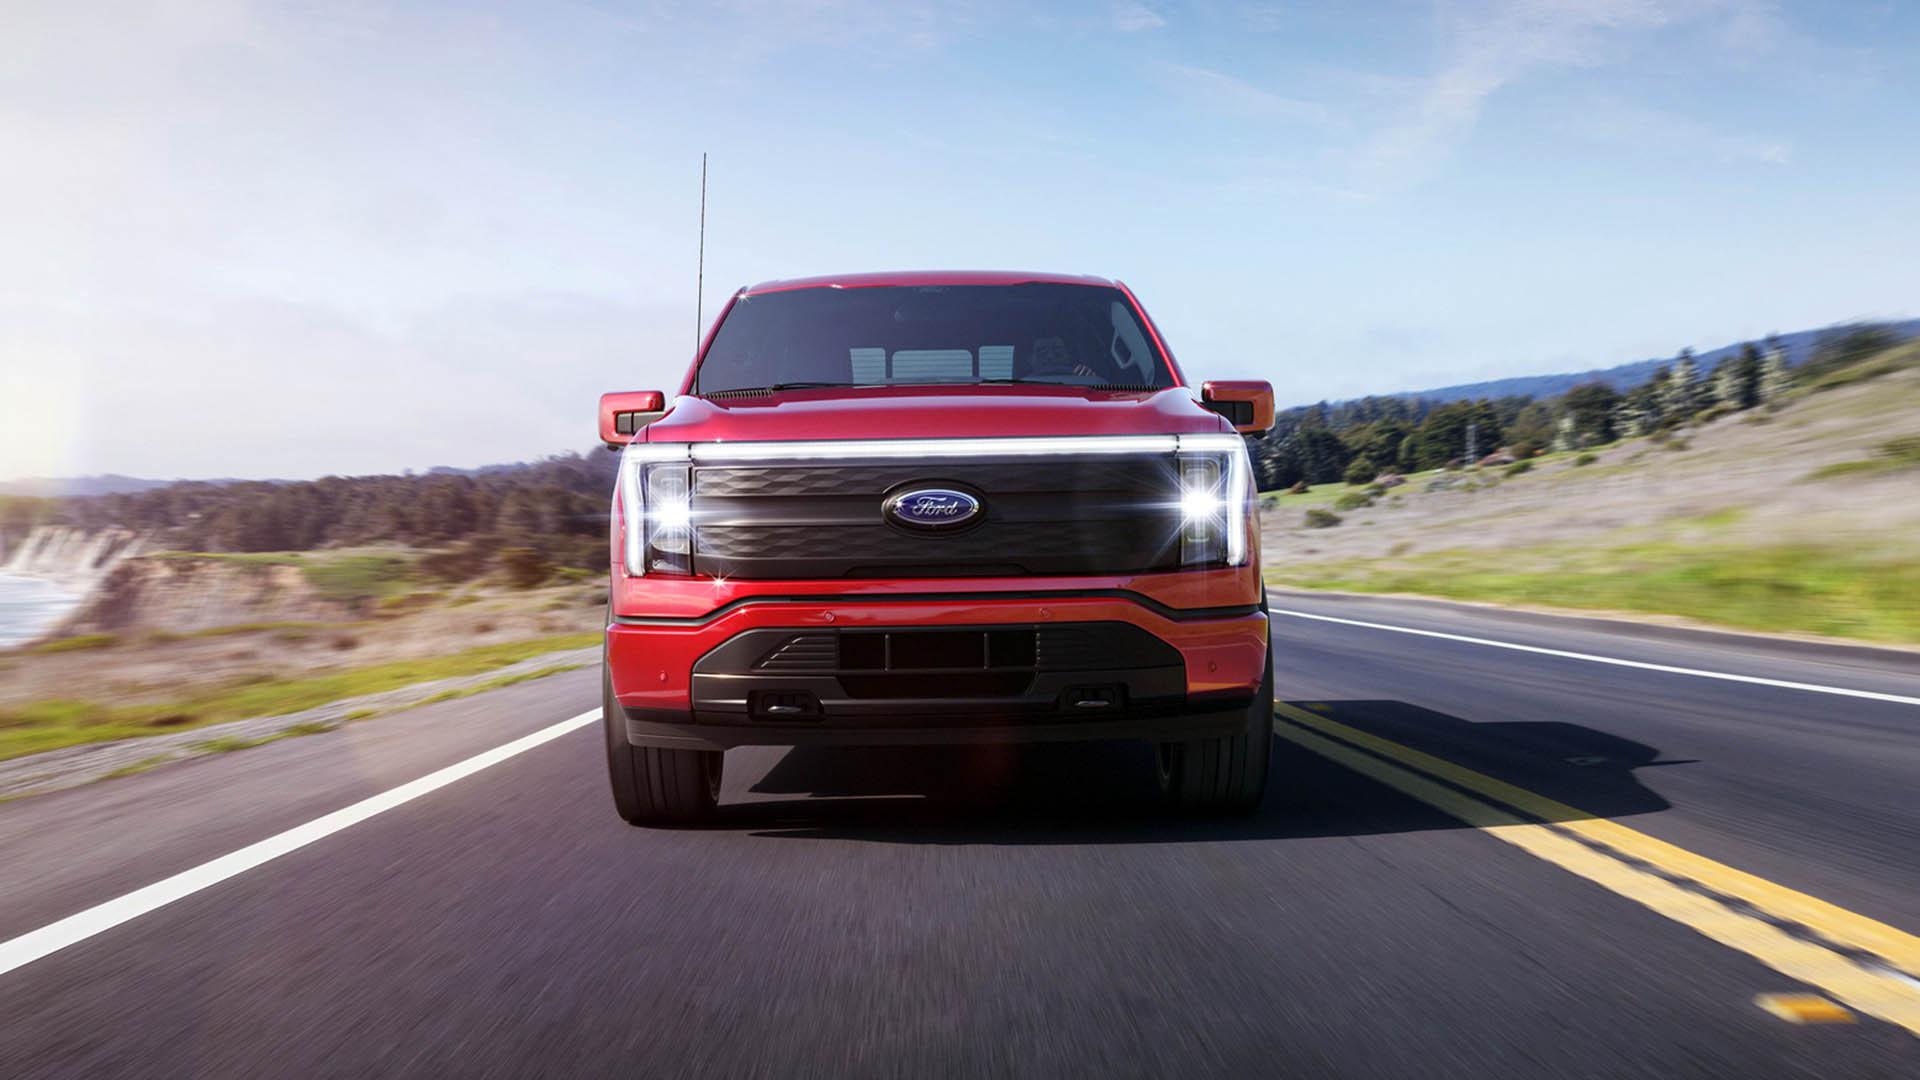 H Ford ετοιμάζει δύο νέες πλατφόρμες για ηλεκτρικά οχήματα